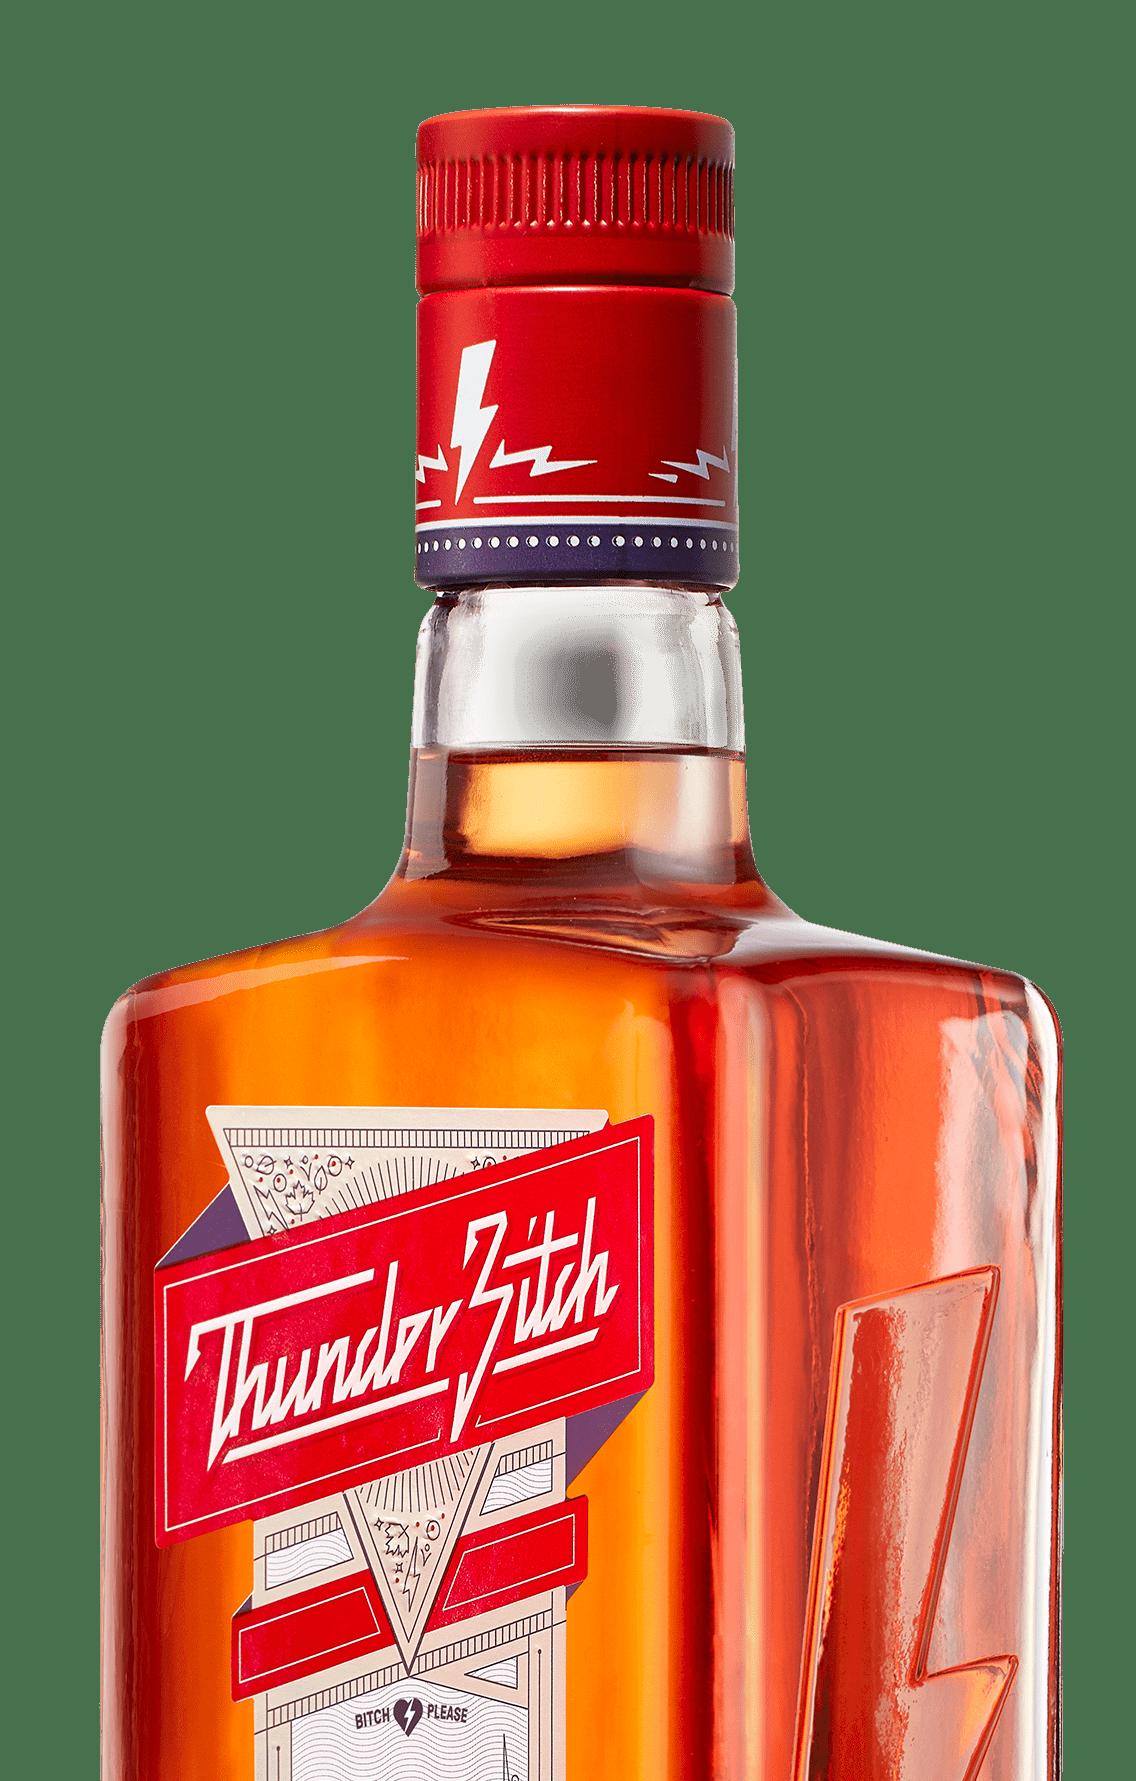 Thunderbitch | Drinks21